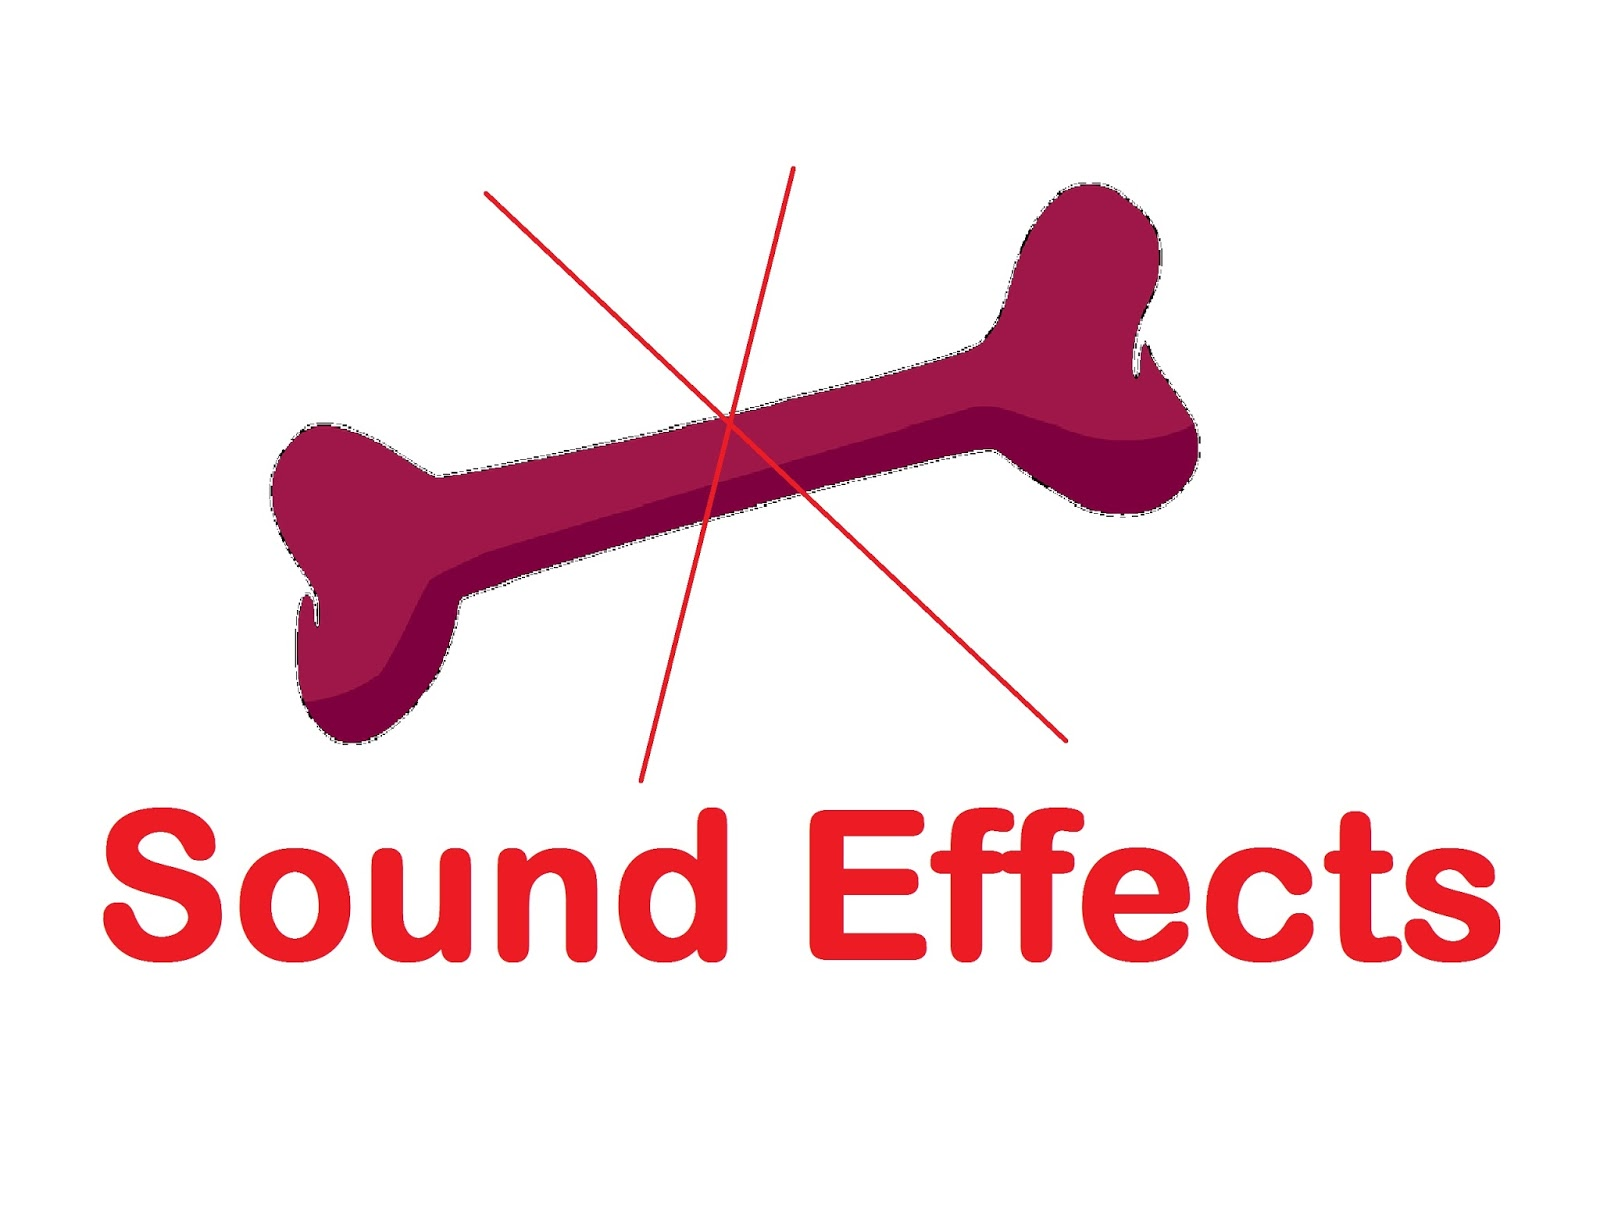 All Sound Effects: bones sound effects